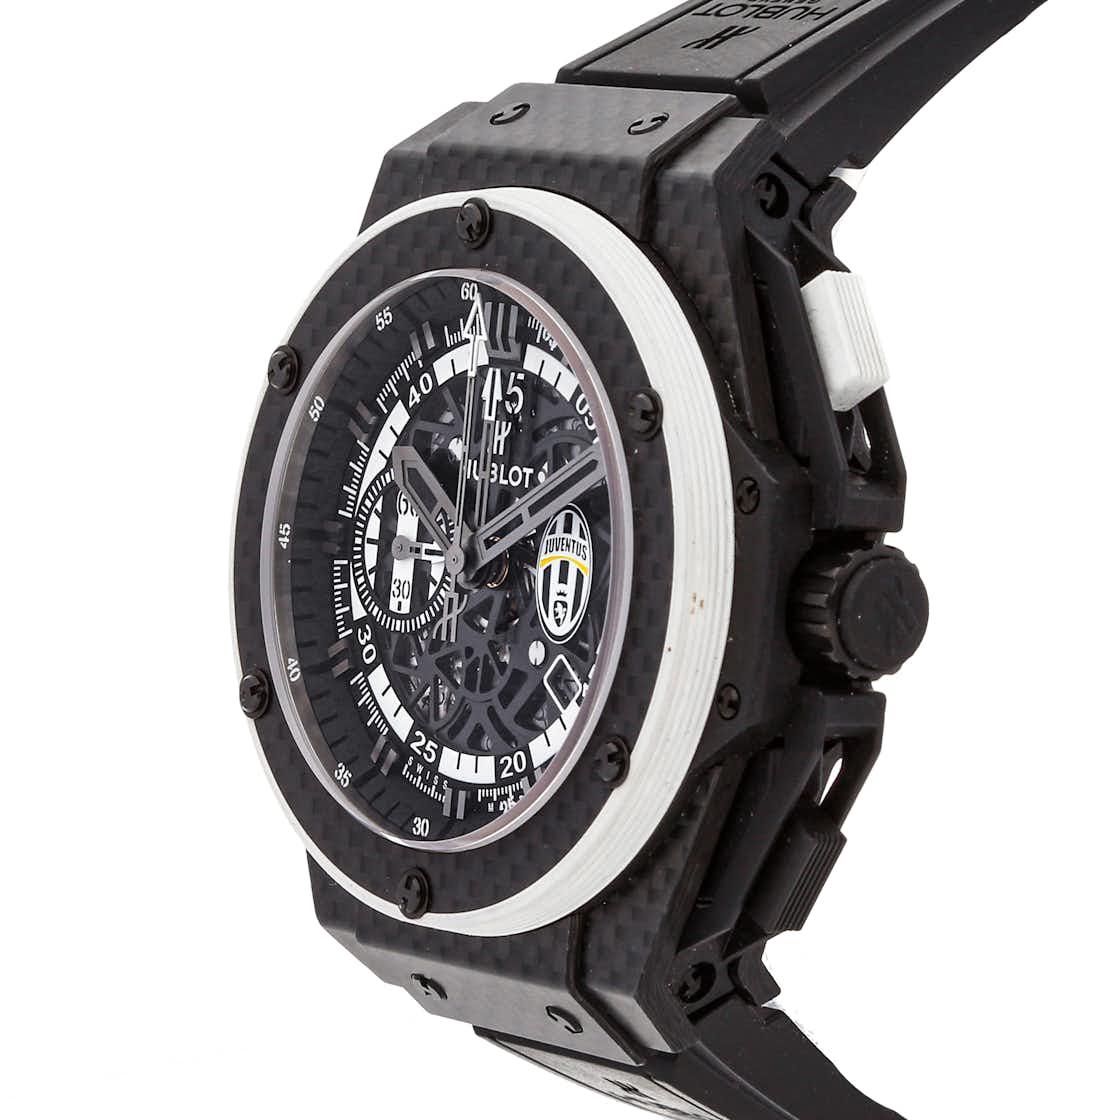 Hublot King Power Juventus Limited Edition 716.QX.1121.VR.JUV13